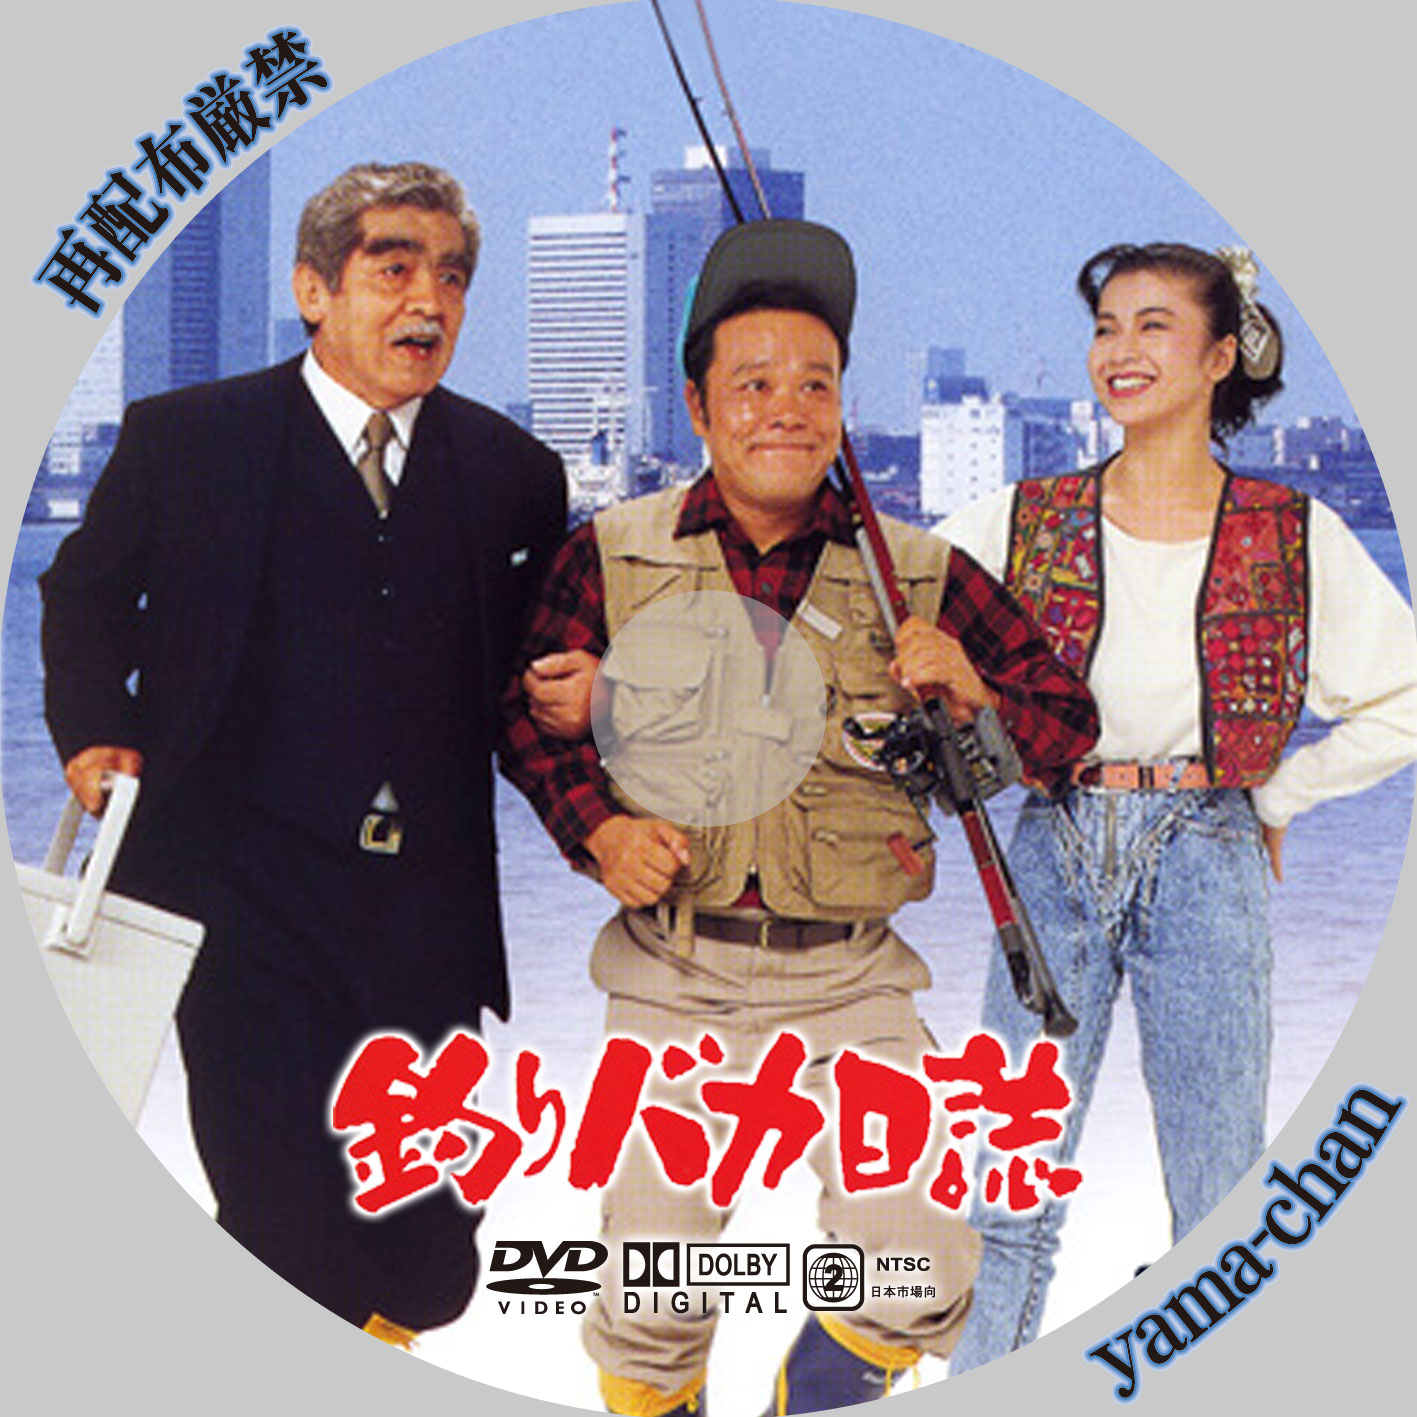 yama-chanのラベル工房 <b>釣りバカ日誌</b>